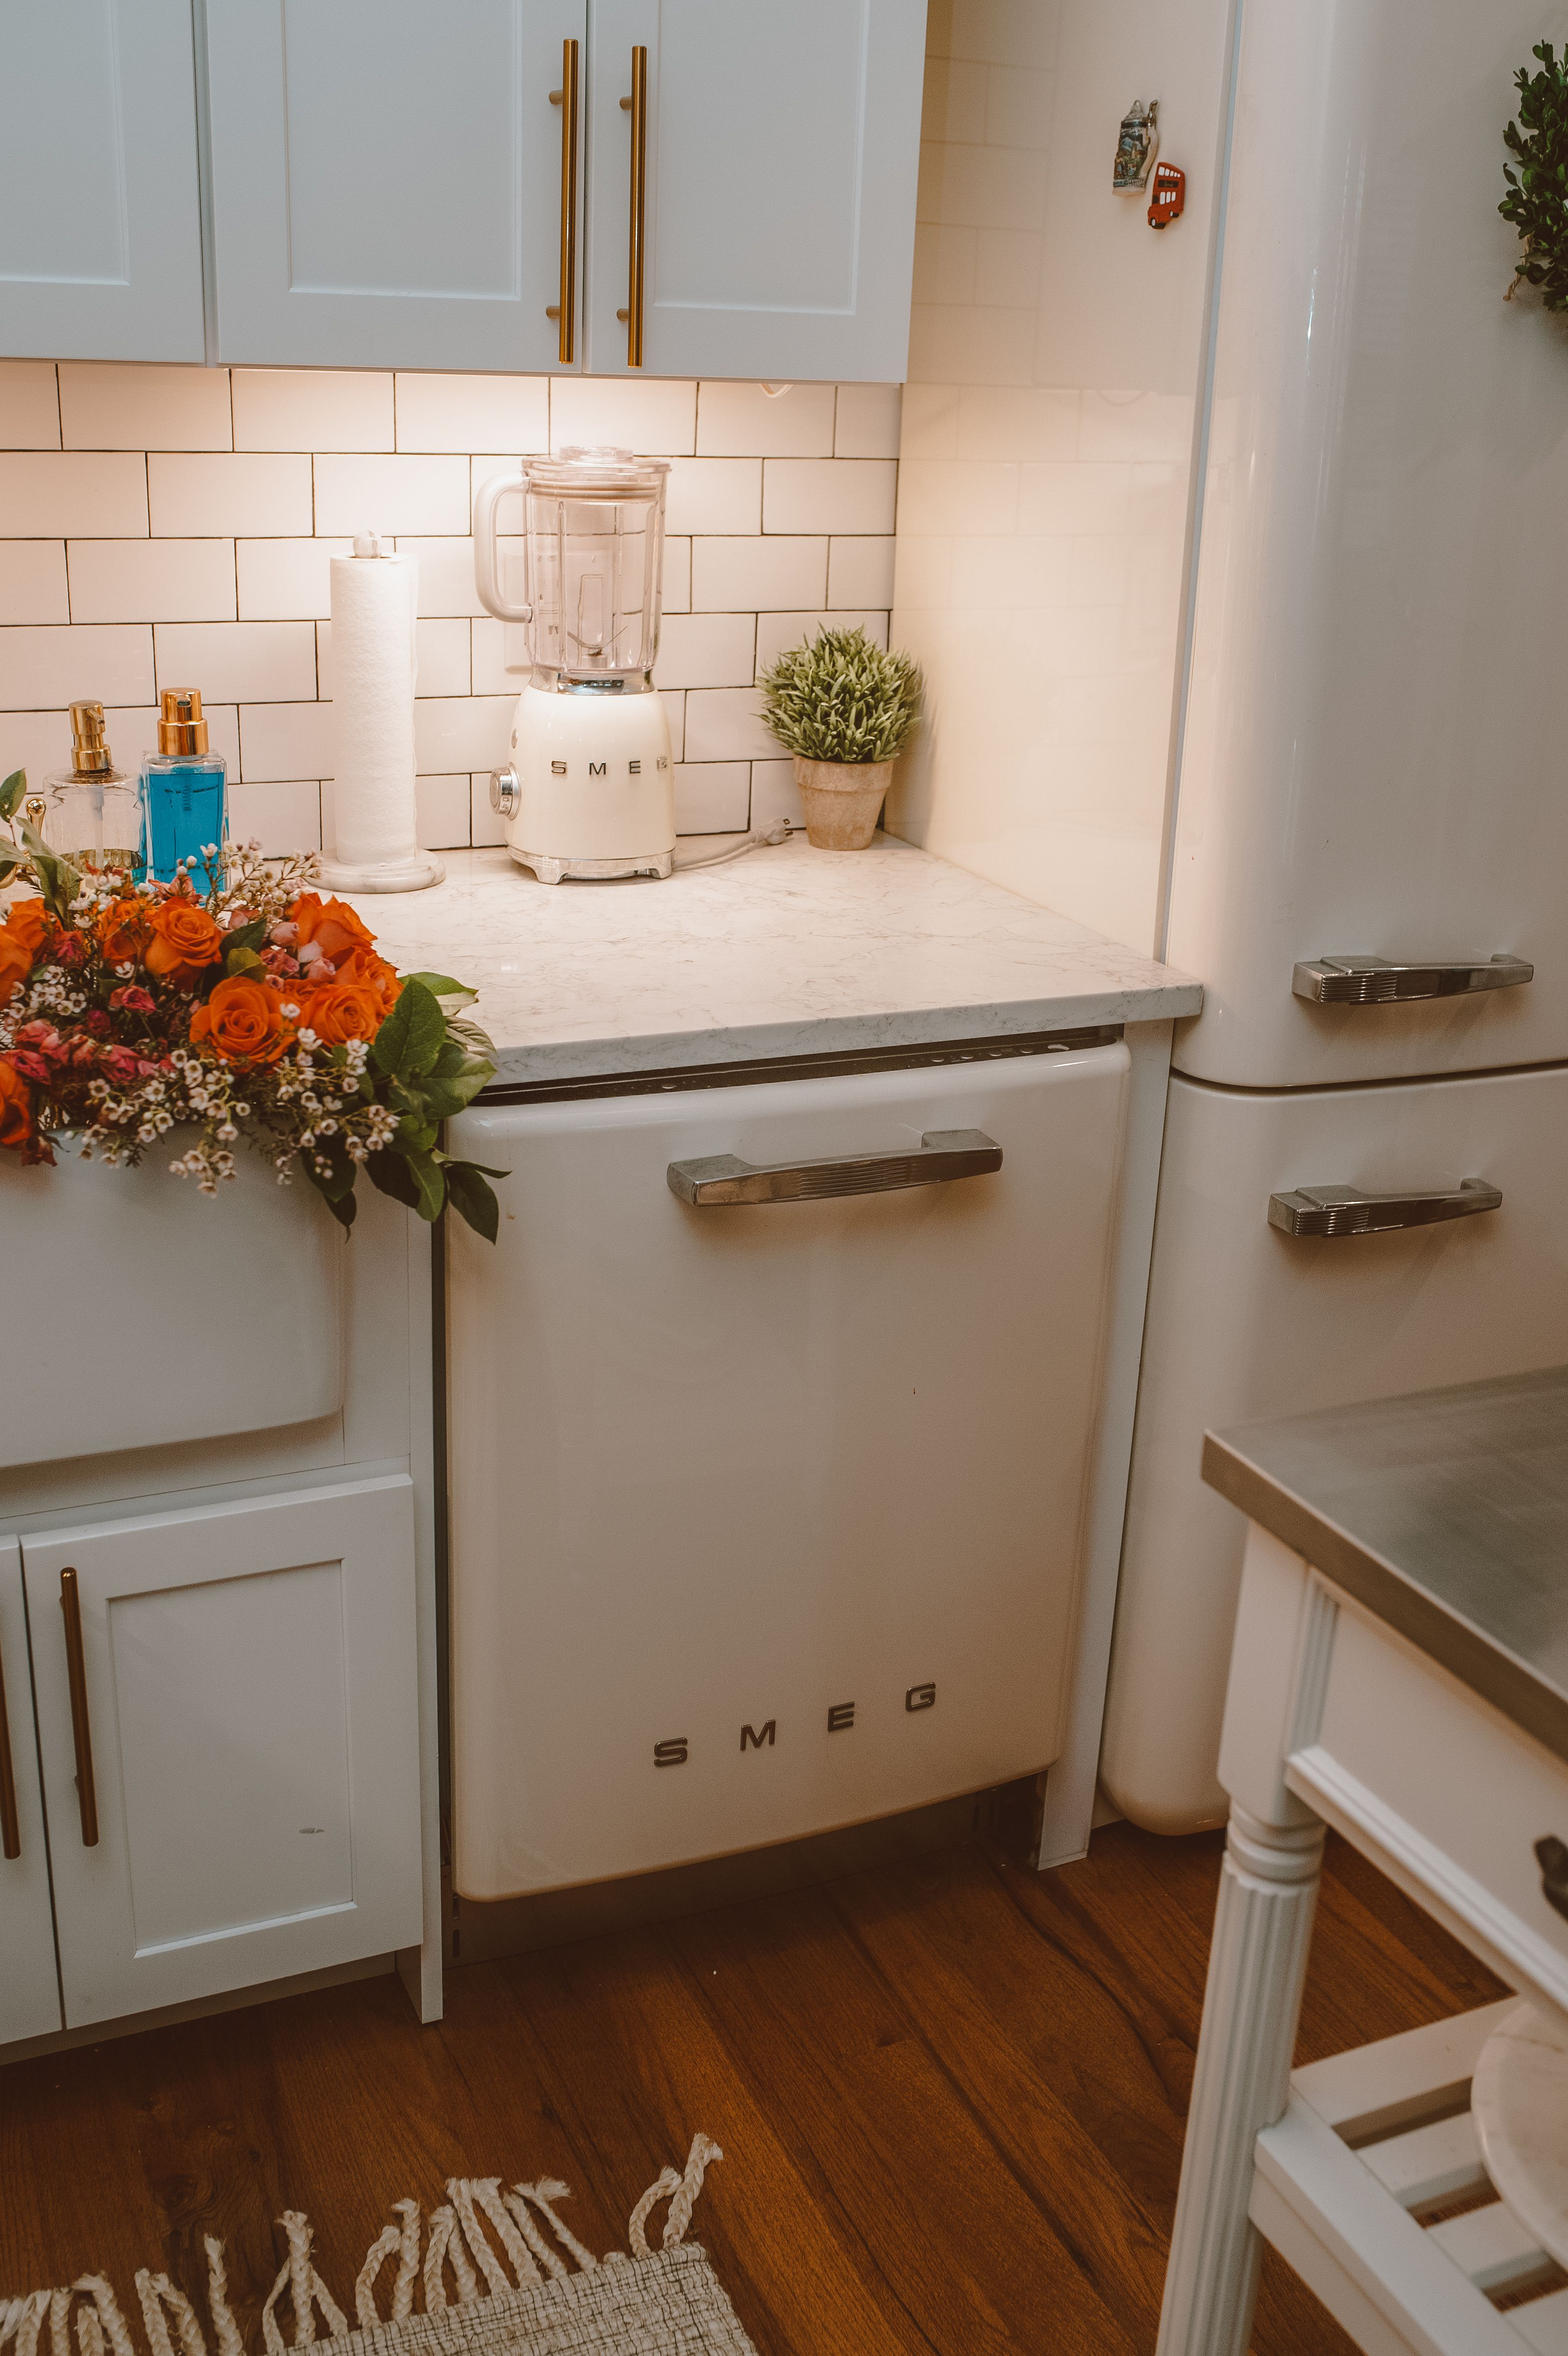 Our SMEG Appliances from Bed Bath & Beyond | Kitchen decor ...